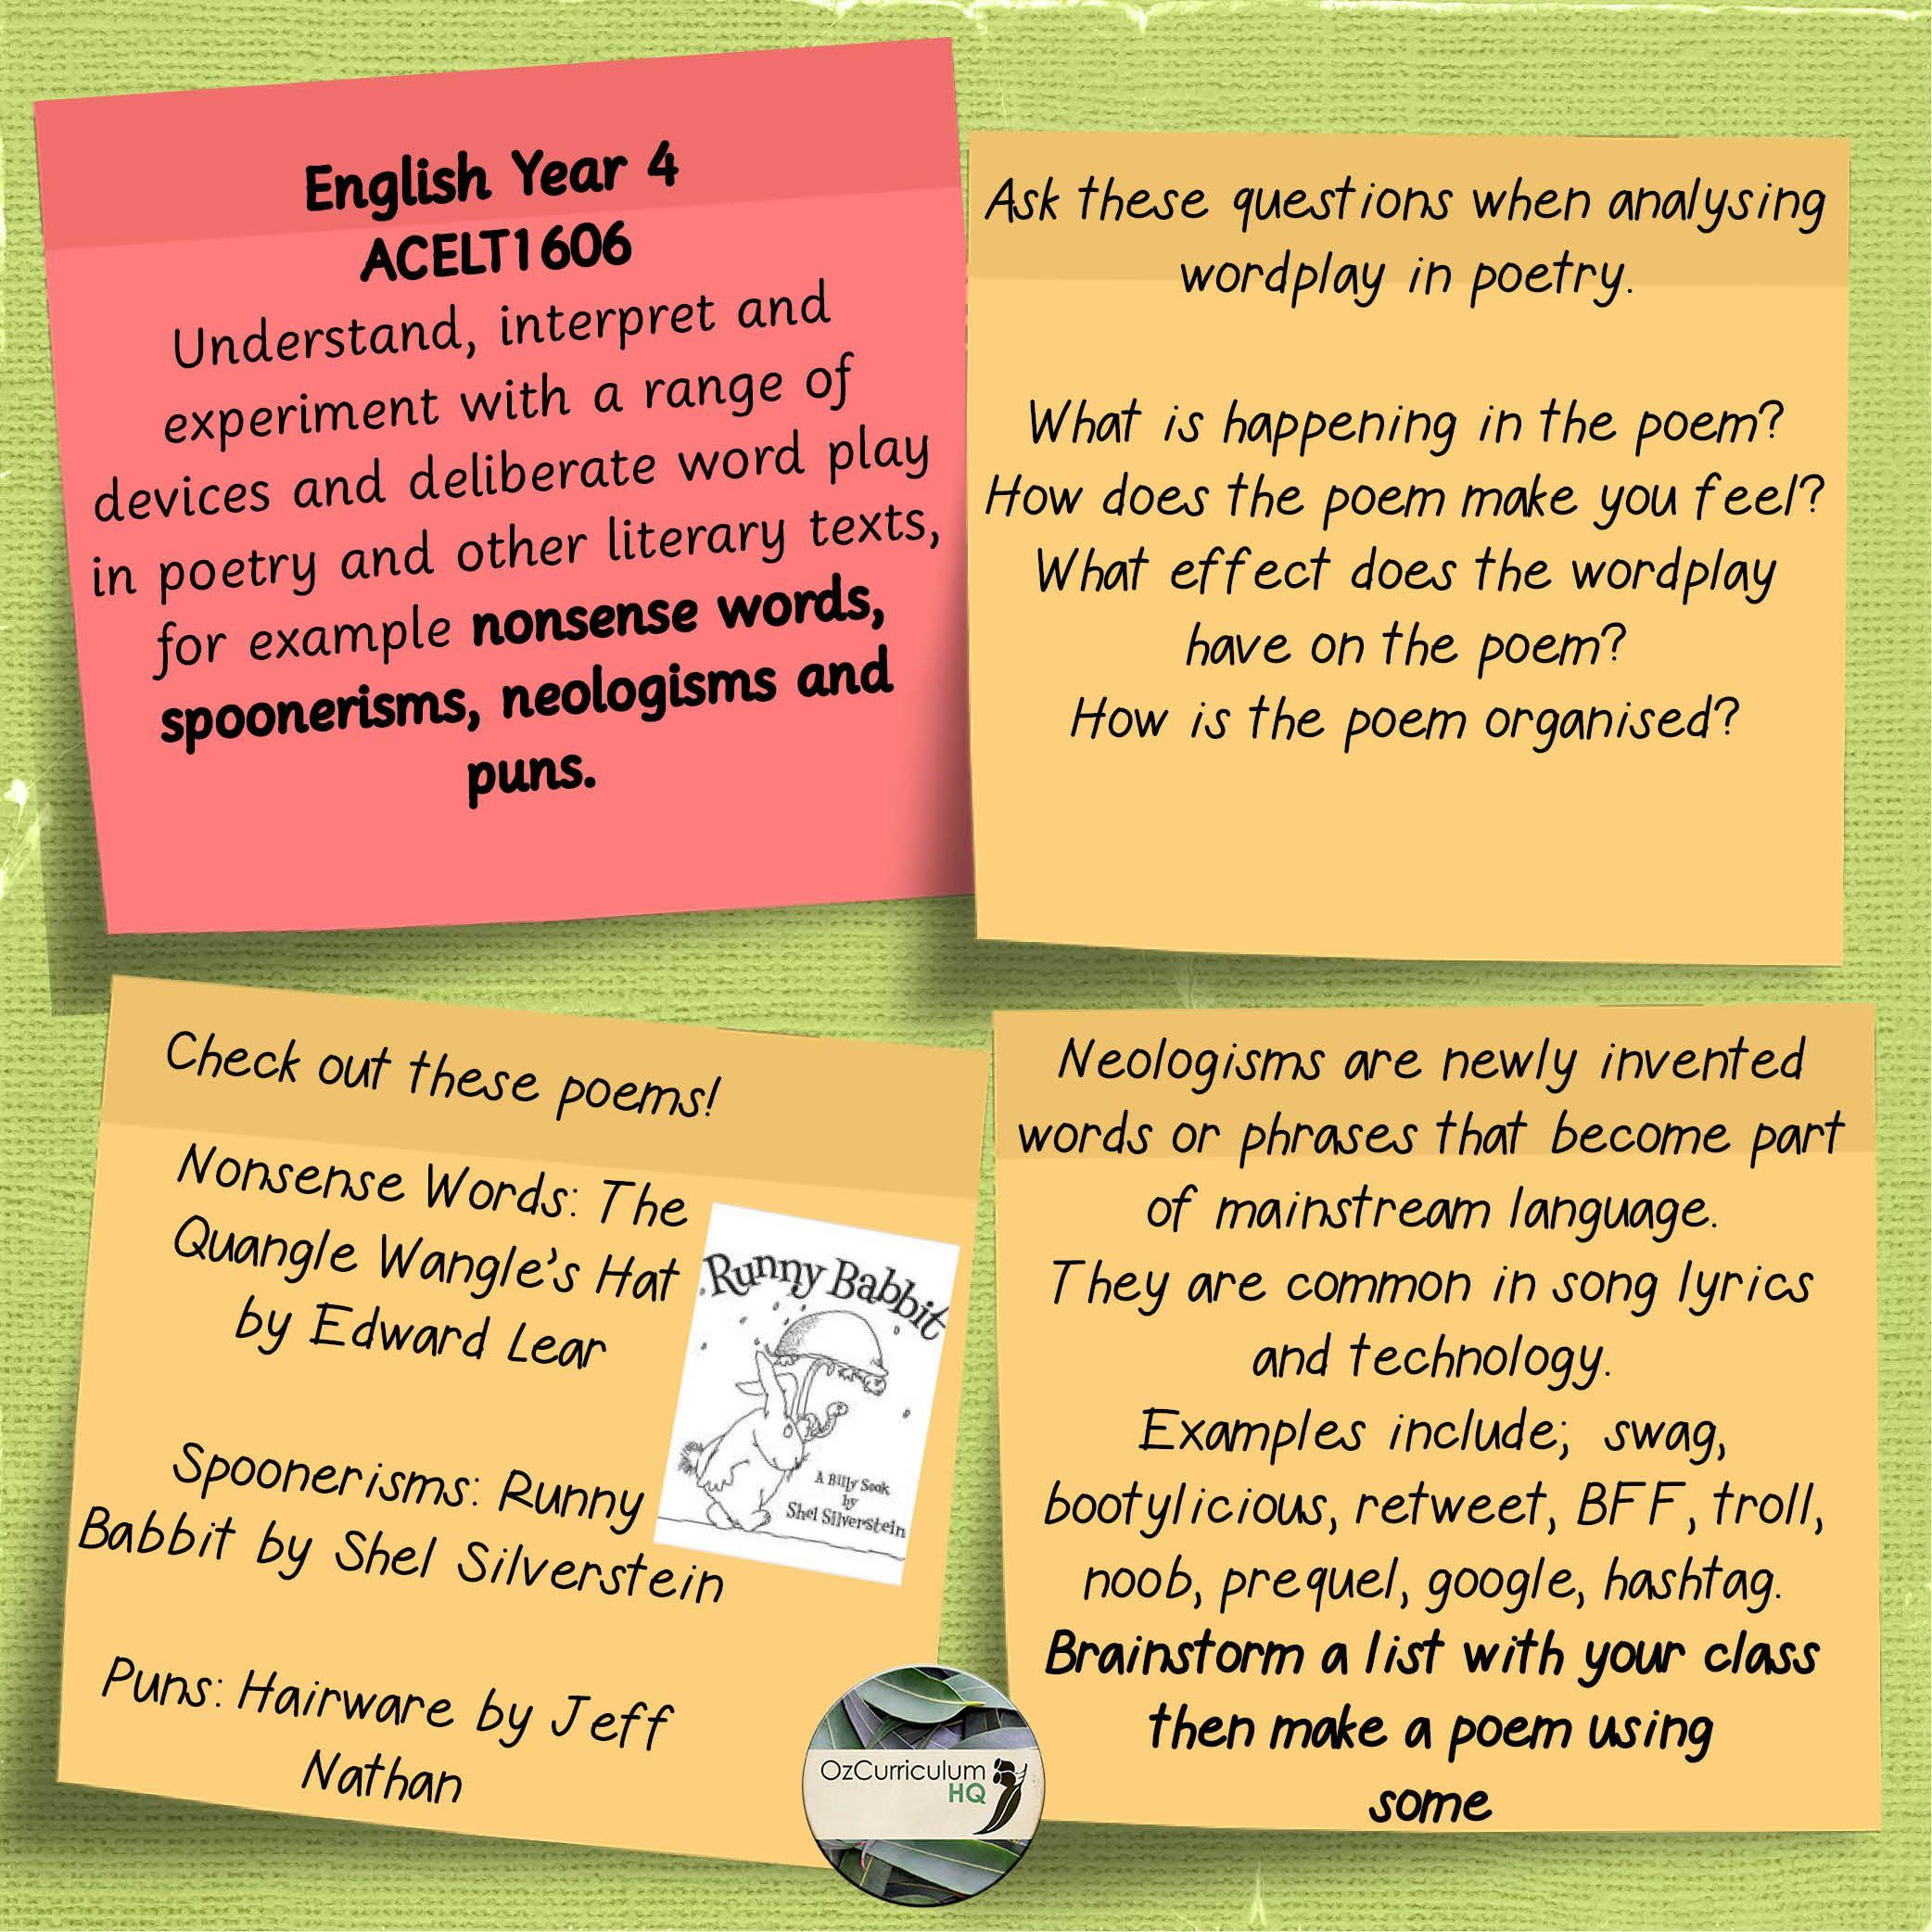 English Year 4 Acelt Nonsense Words Spoonerisms